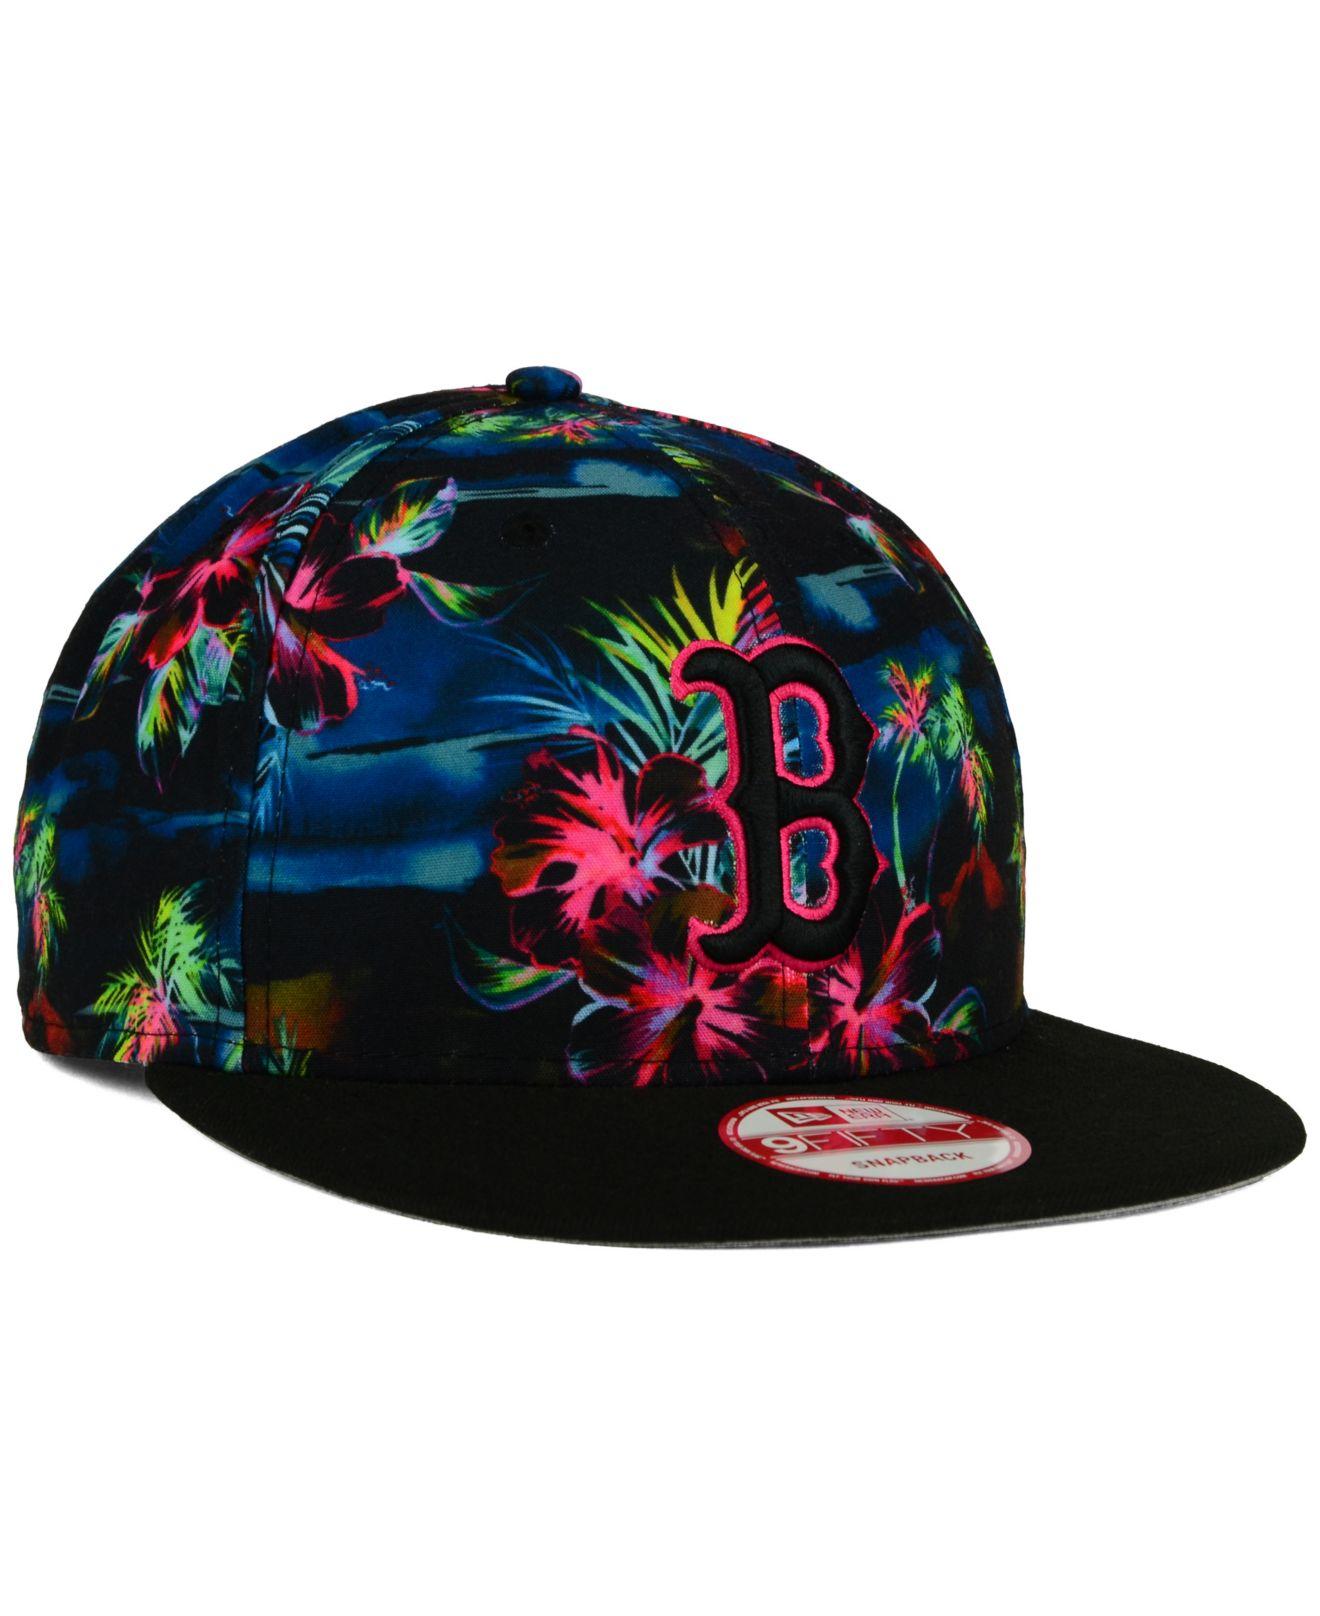 Lyst - KTZ Boston Red Sox Dark Tropic 9fifty Snapback Cap in Blue ... 7f01404759c